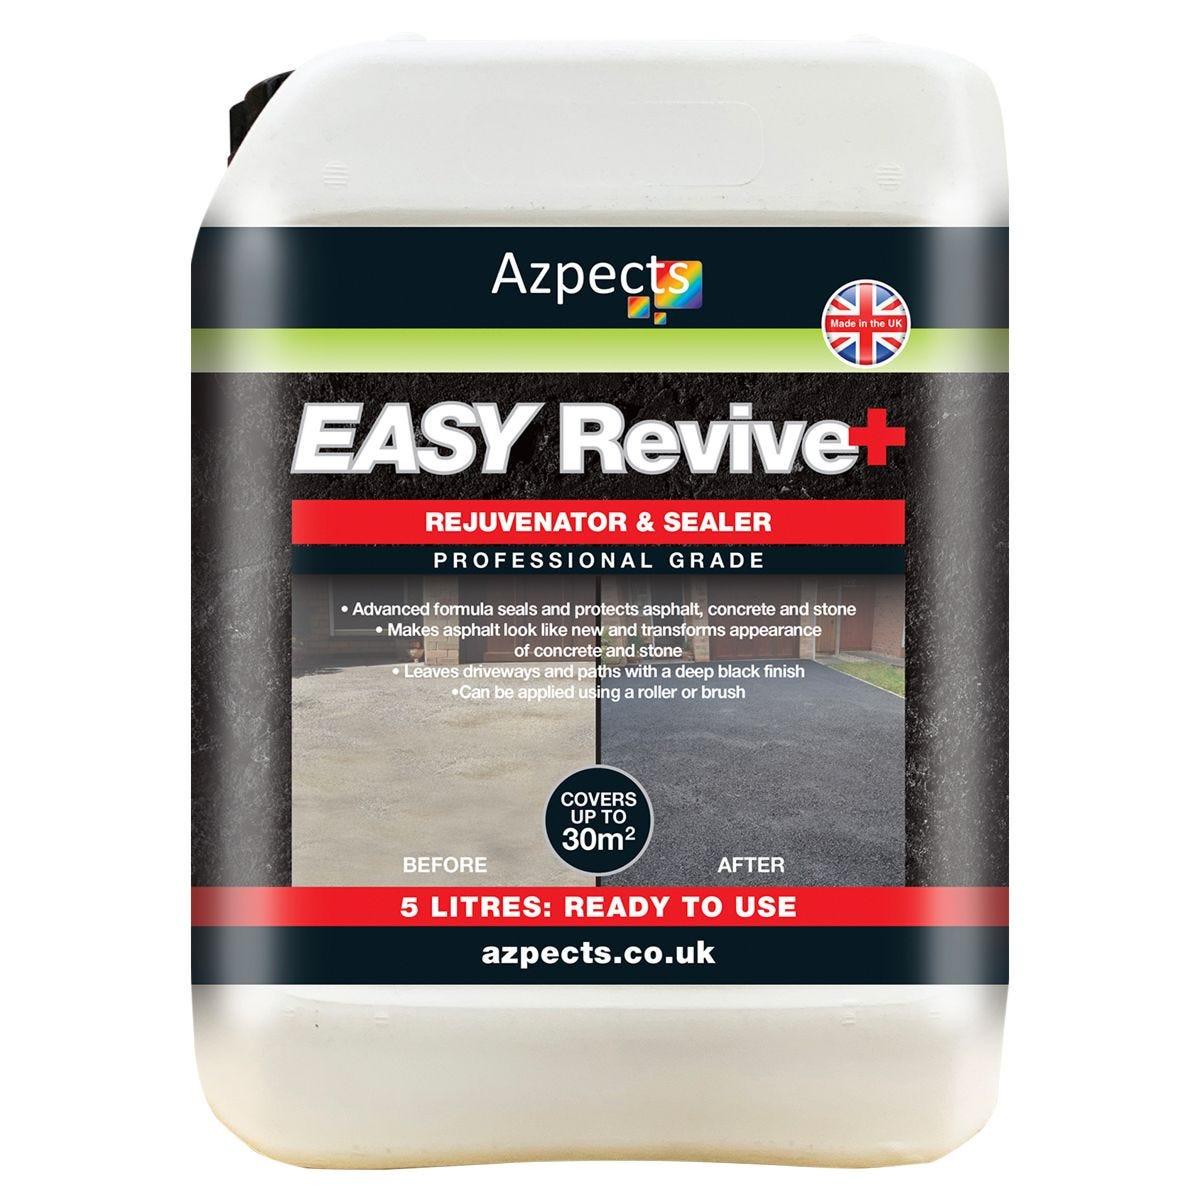 Aspects EASY Revive & Sealer - 5L